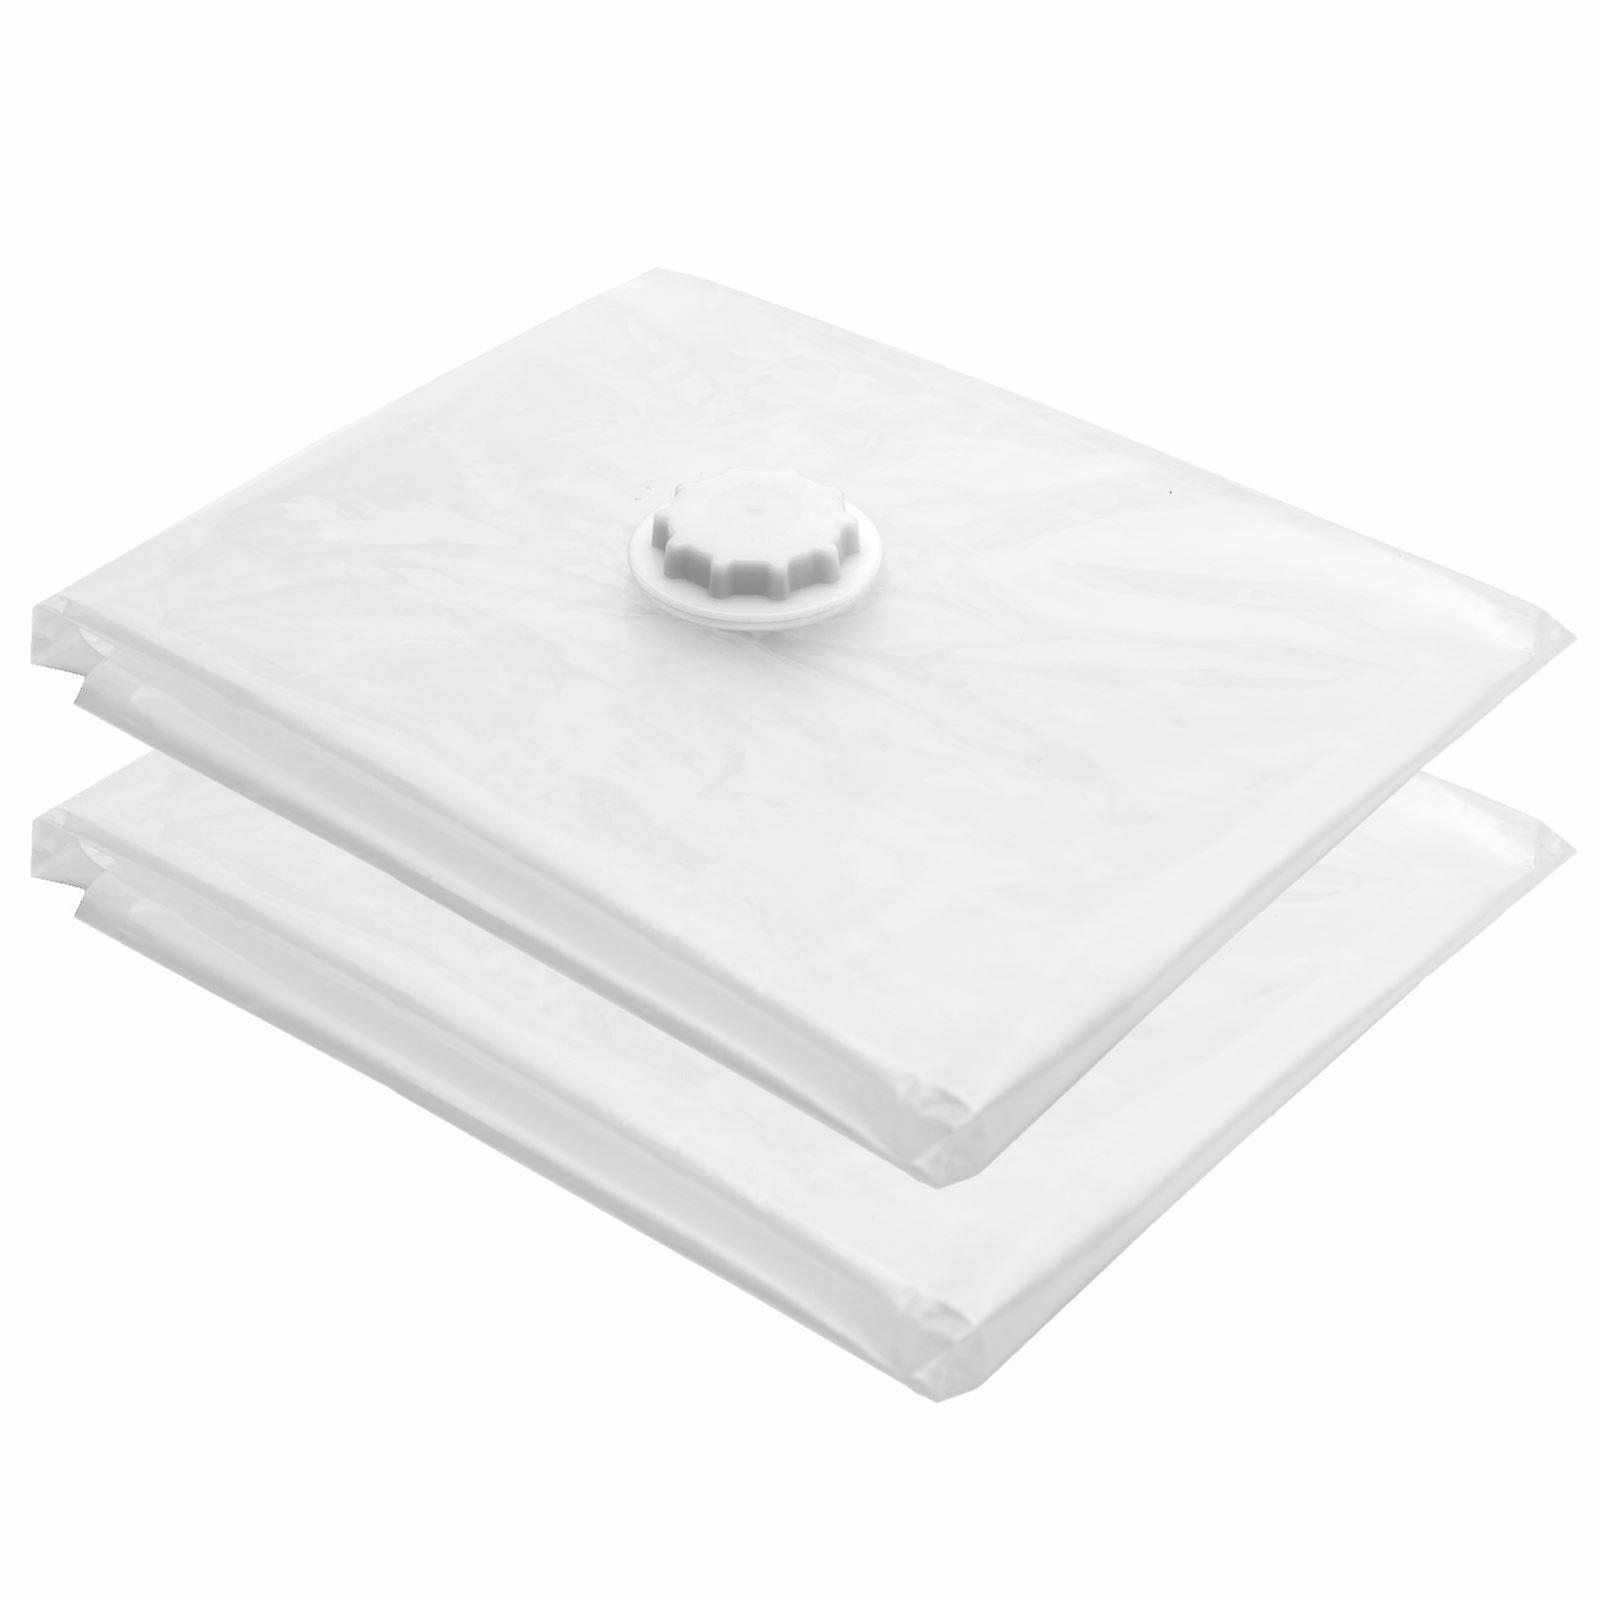 10 x Large 80 x 100cm Vacuum Storage Space Saving Vac Bag Clothes Bedding